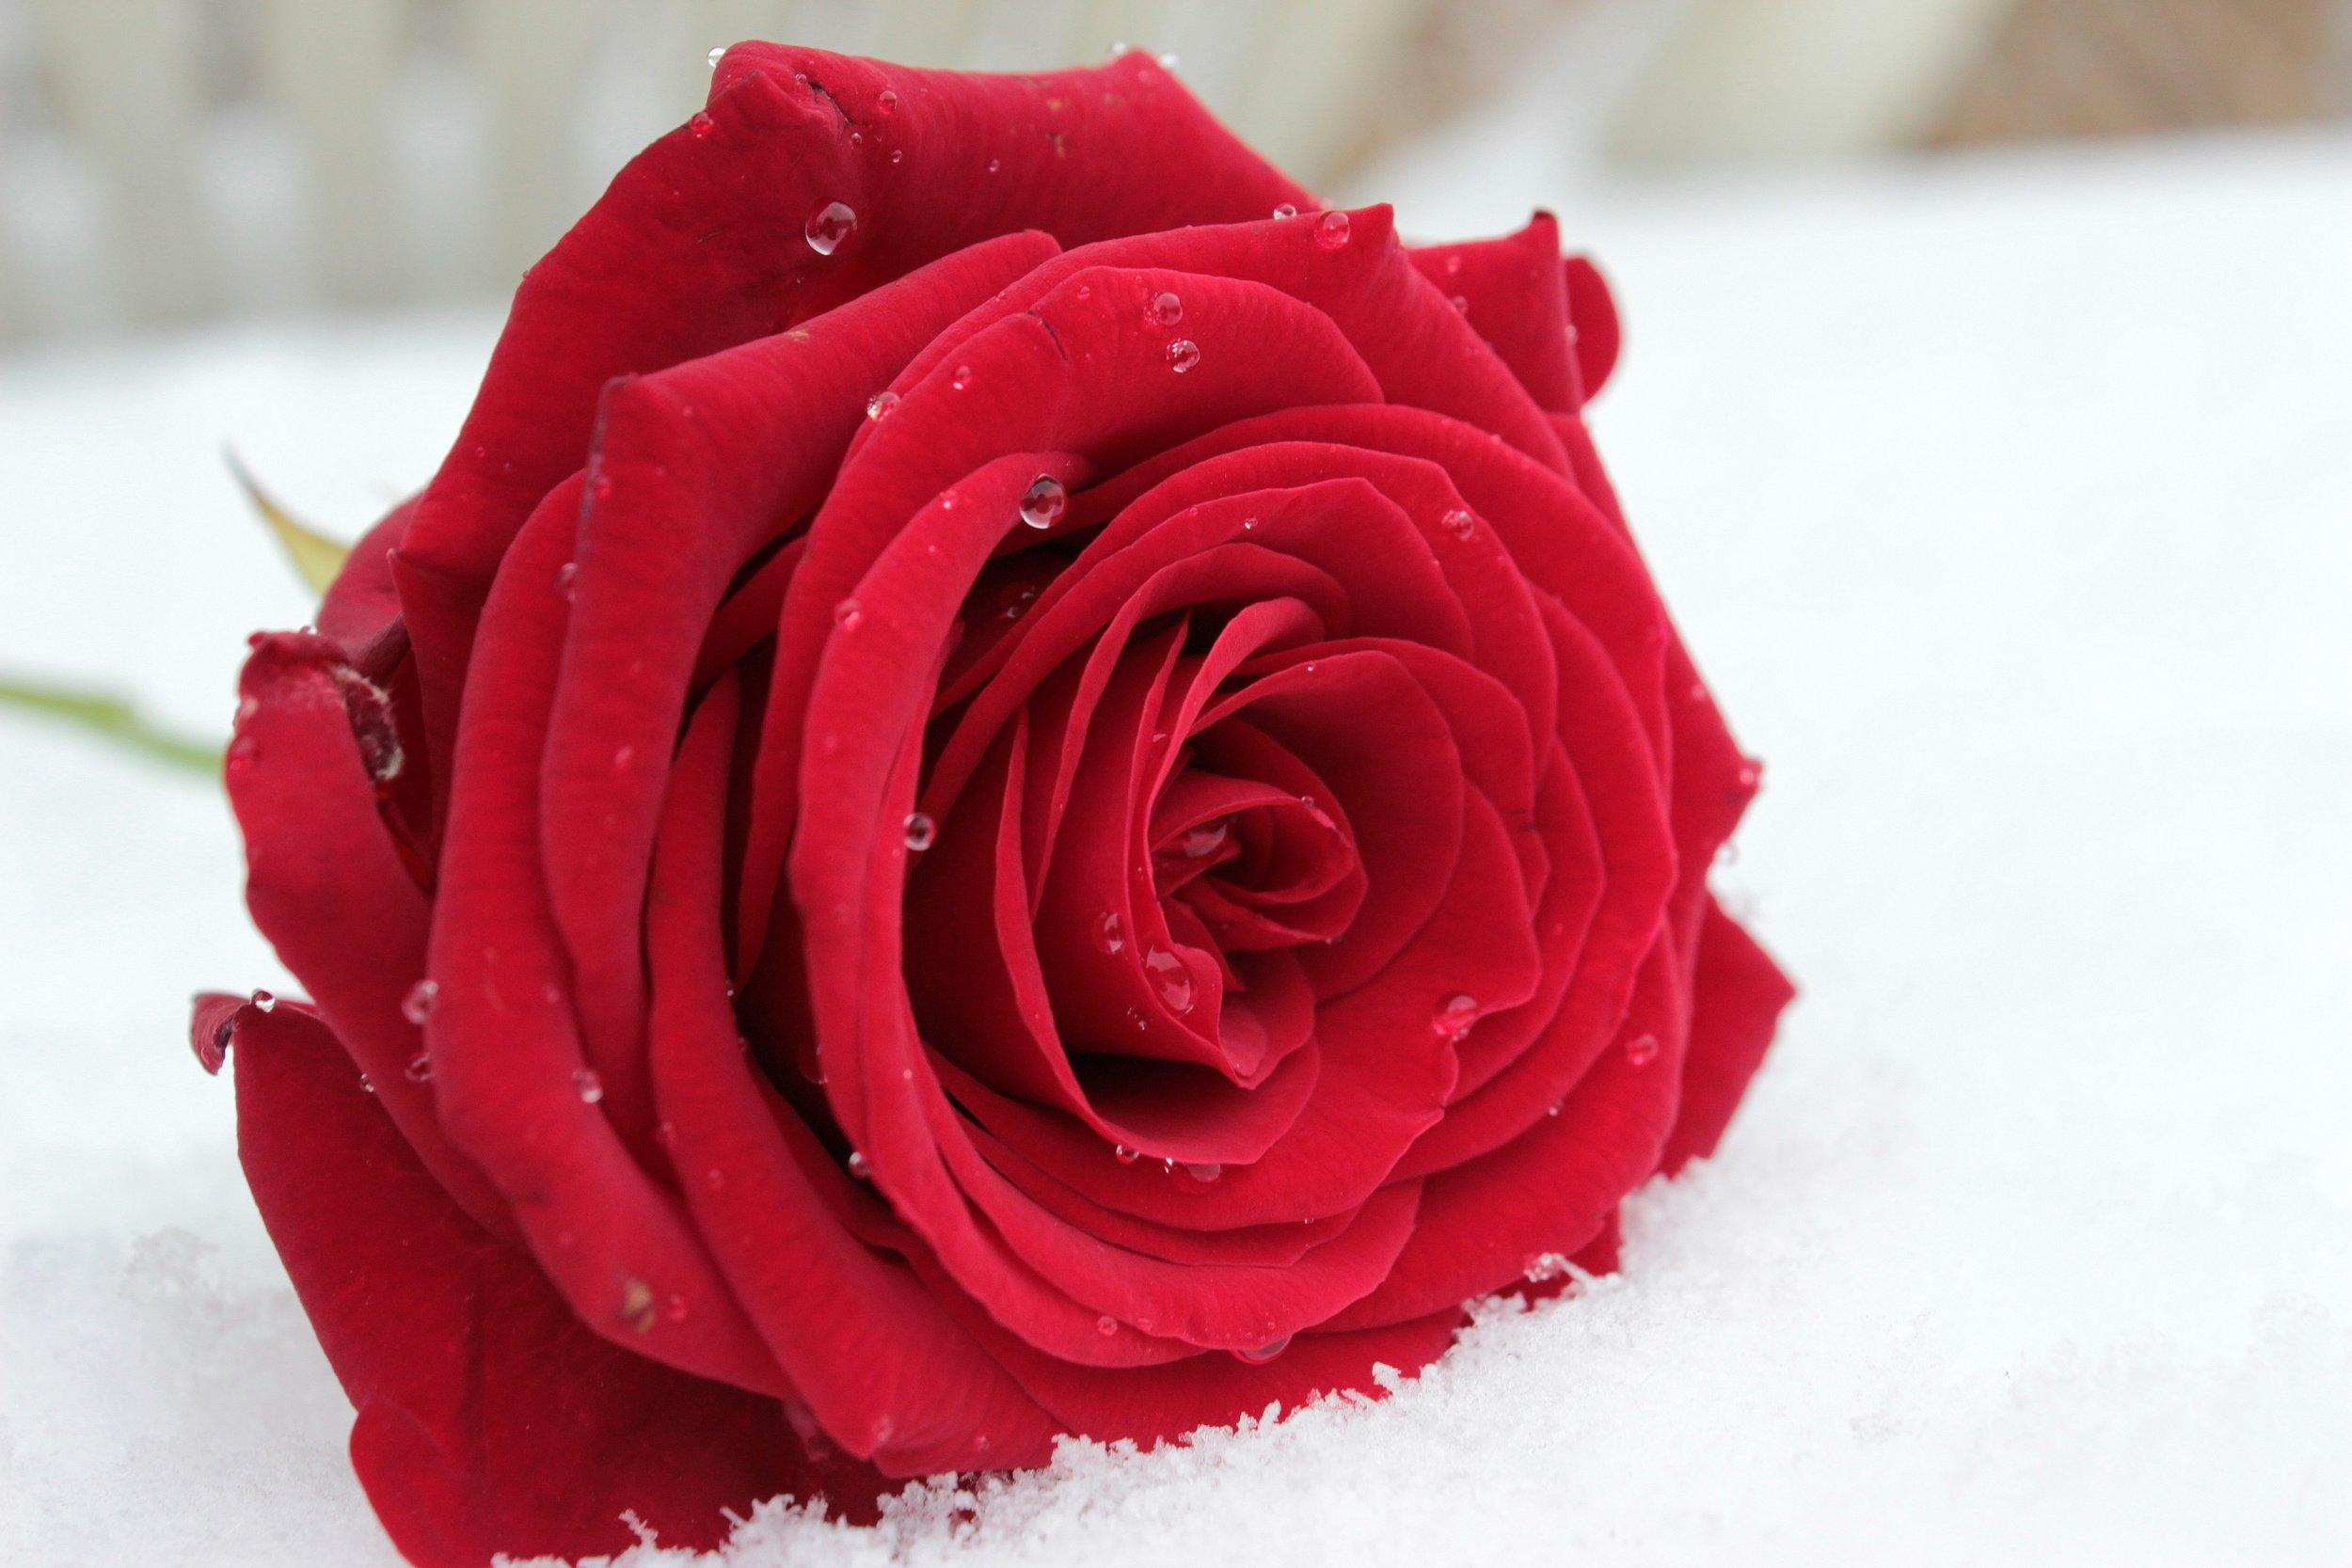 rose-1201291.jpg